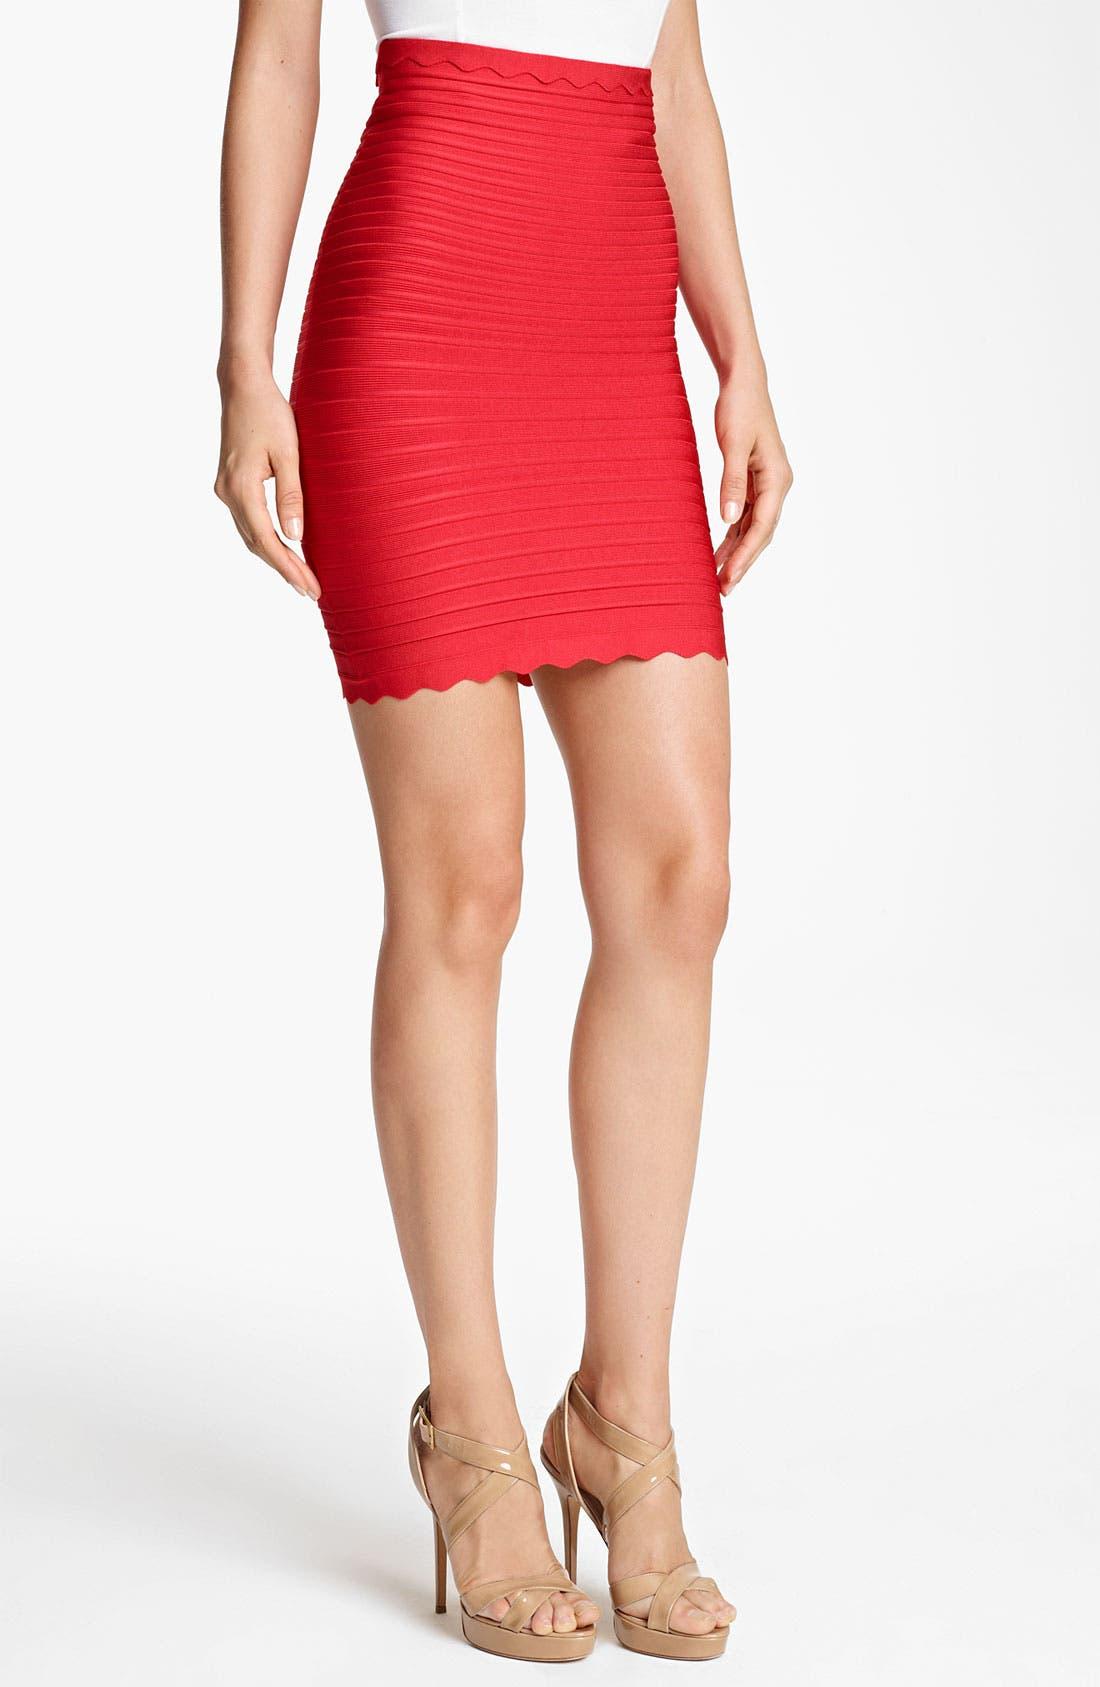 Alternate Image 1 Selected - Herve Leger Scalloped Pencil Skirt